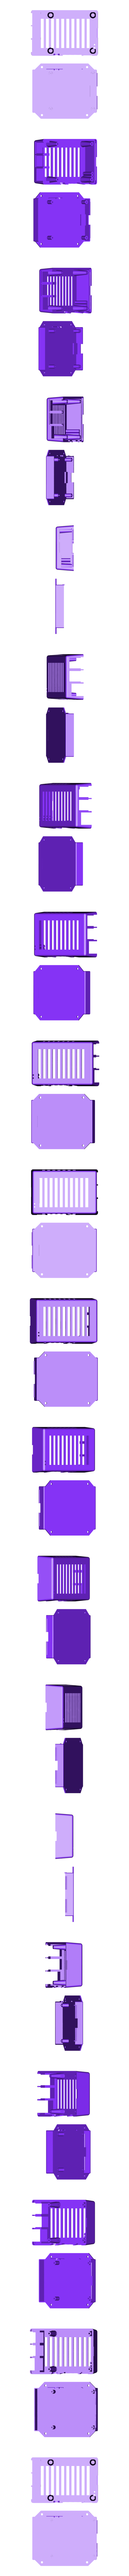 raspberry_pi_3.stl Download free STL file Ventilated Raspberry Pi 3/3B+ case • 3D printing object, arpruss